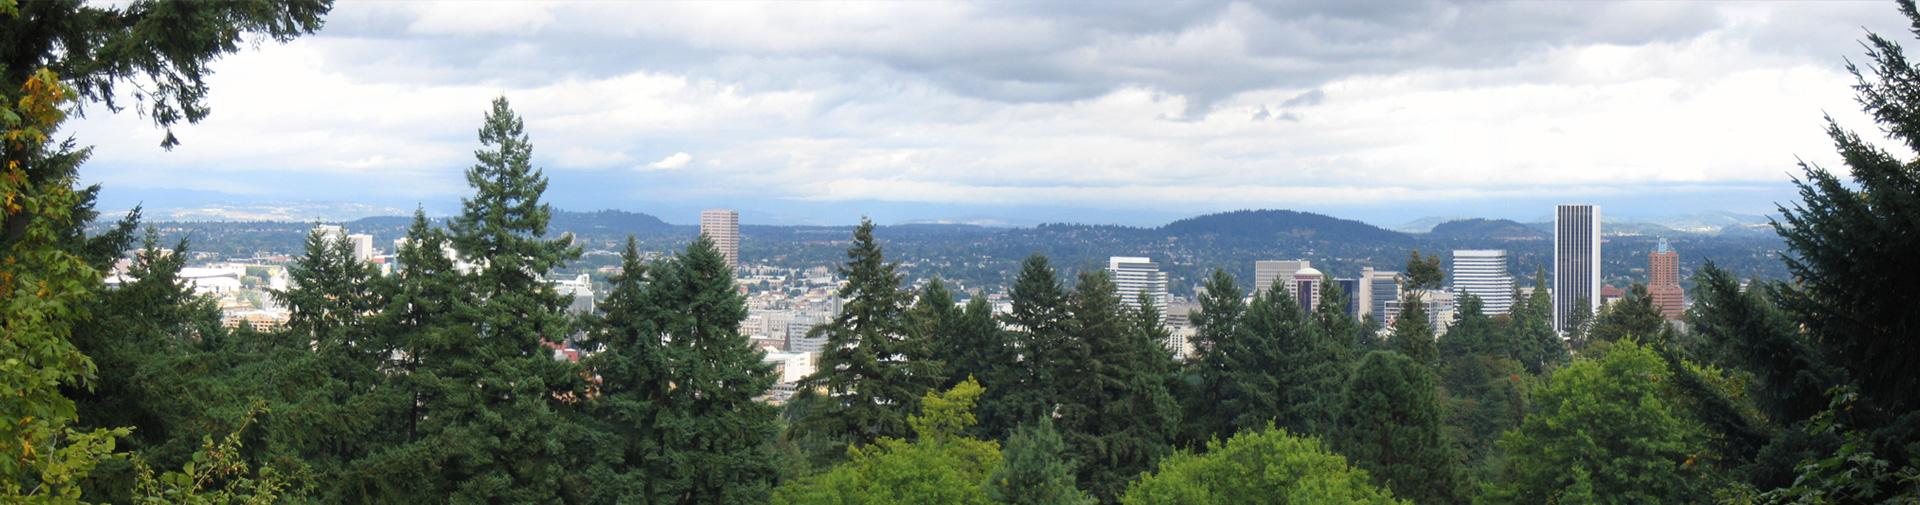 Located near Portland, Oregon